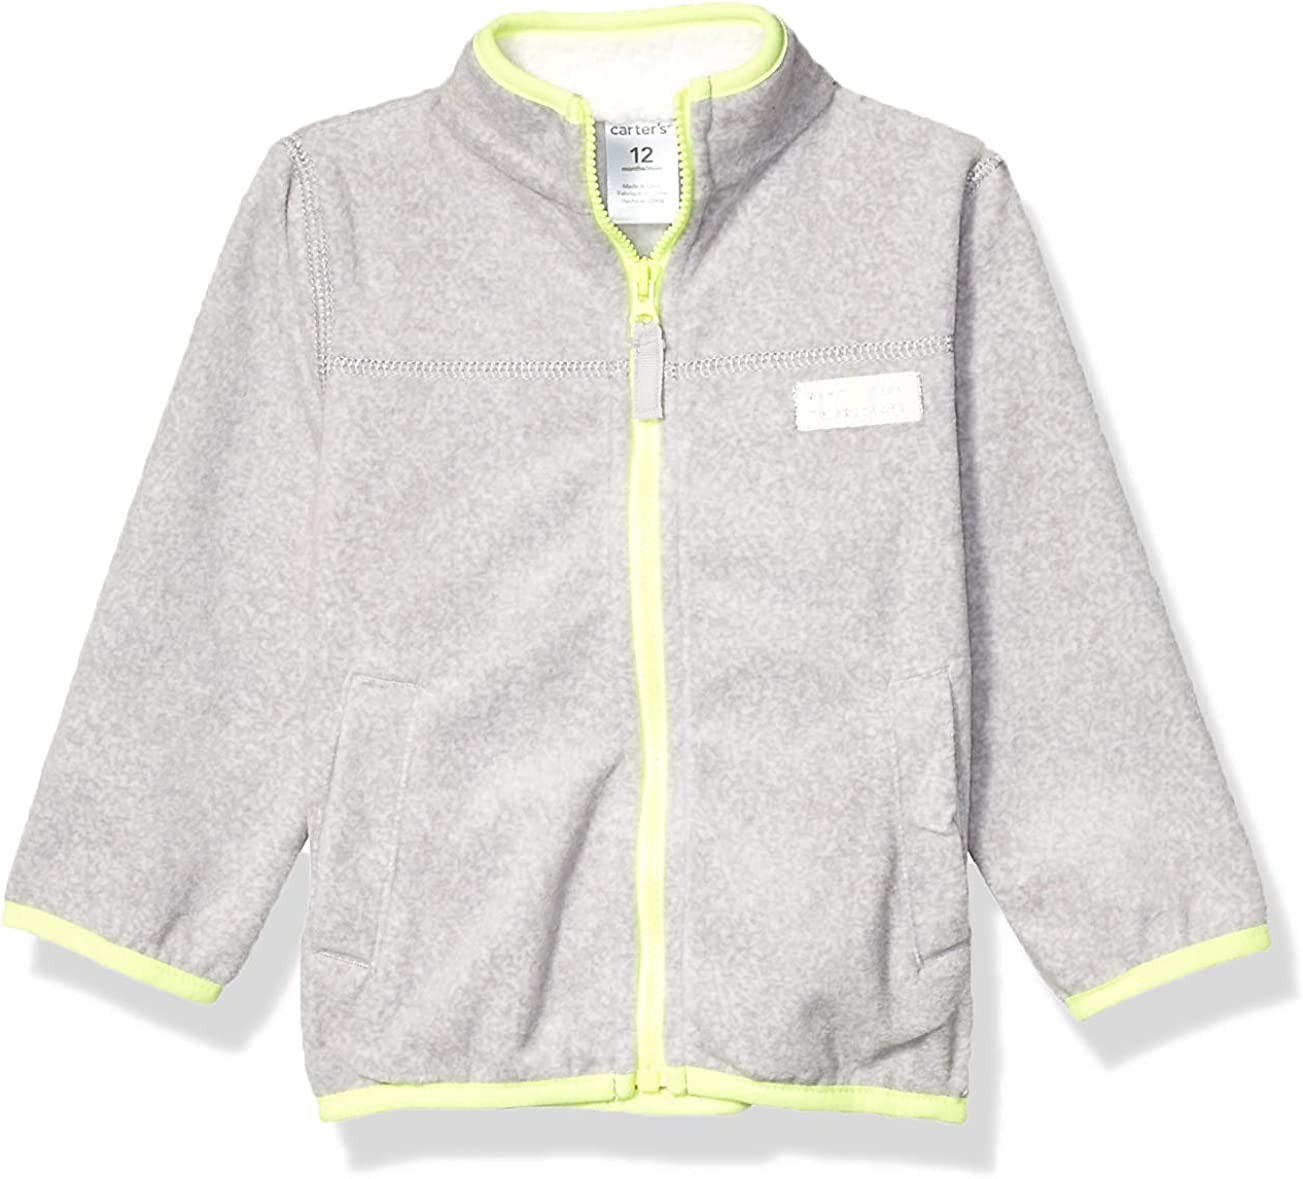 Carter's Baby Girls' Microfleece Jacket (Baby) - Heather - 12 Months